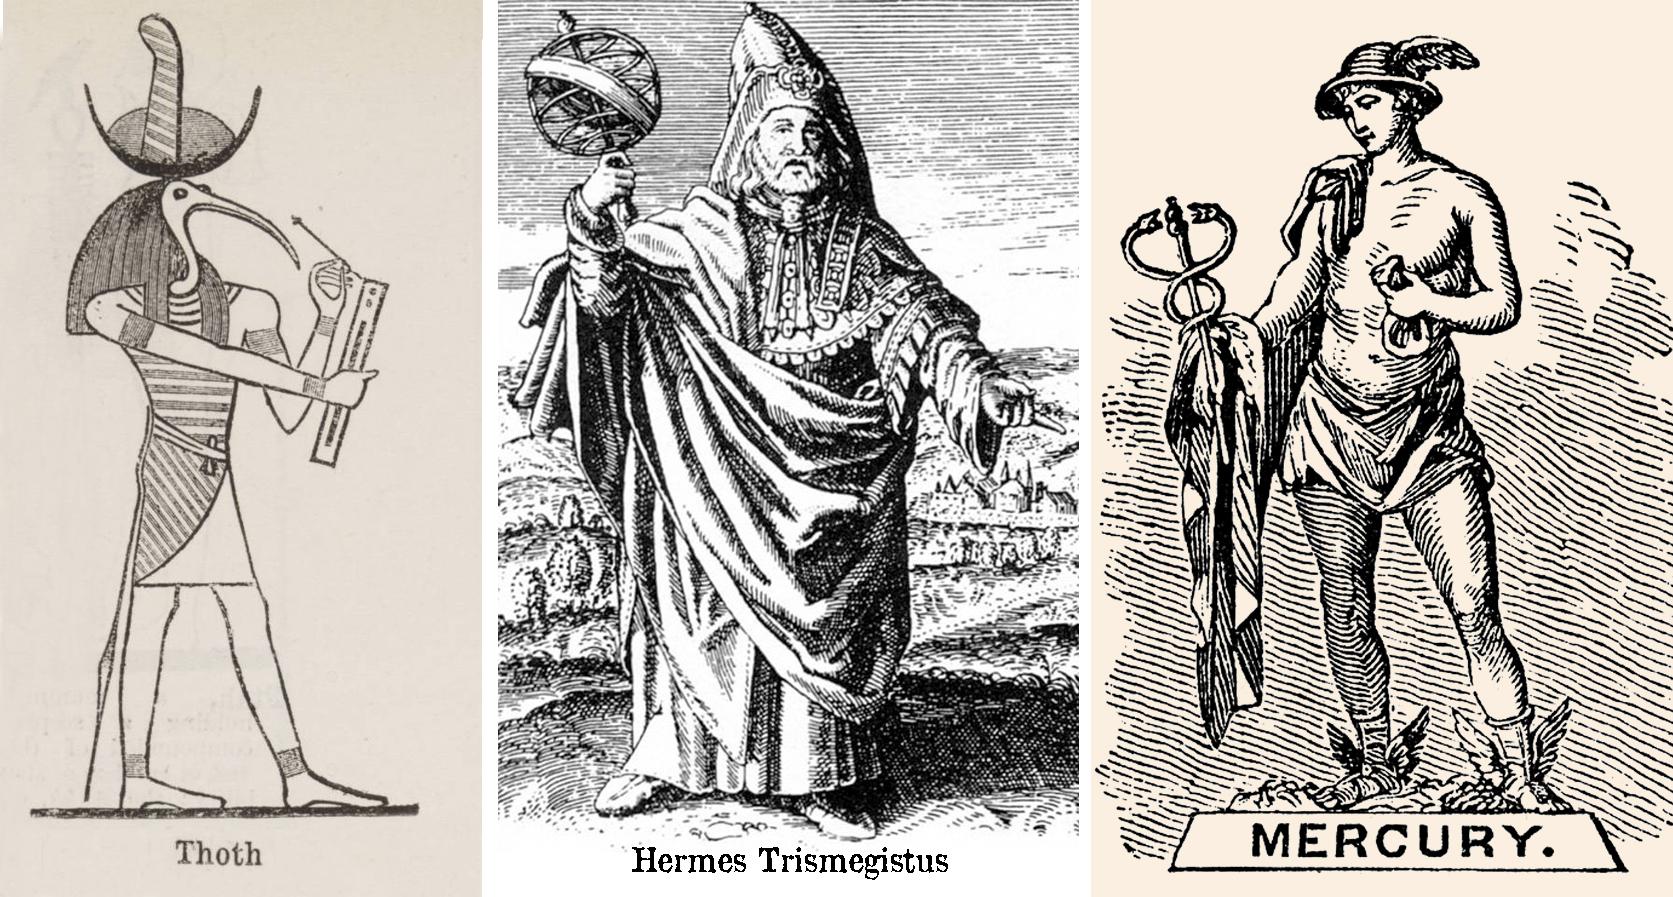 toth-hermes-mercurio